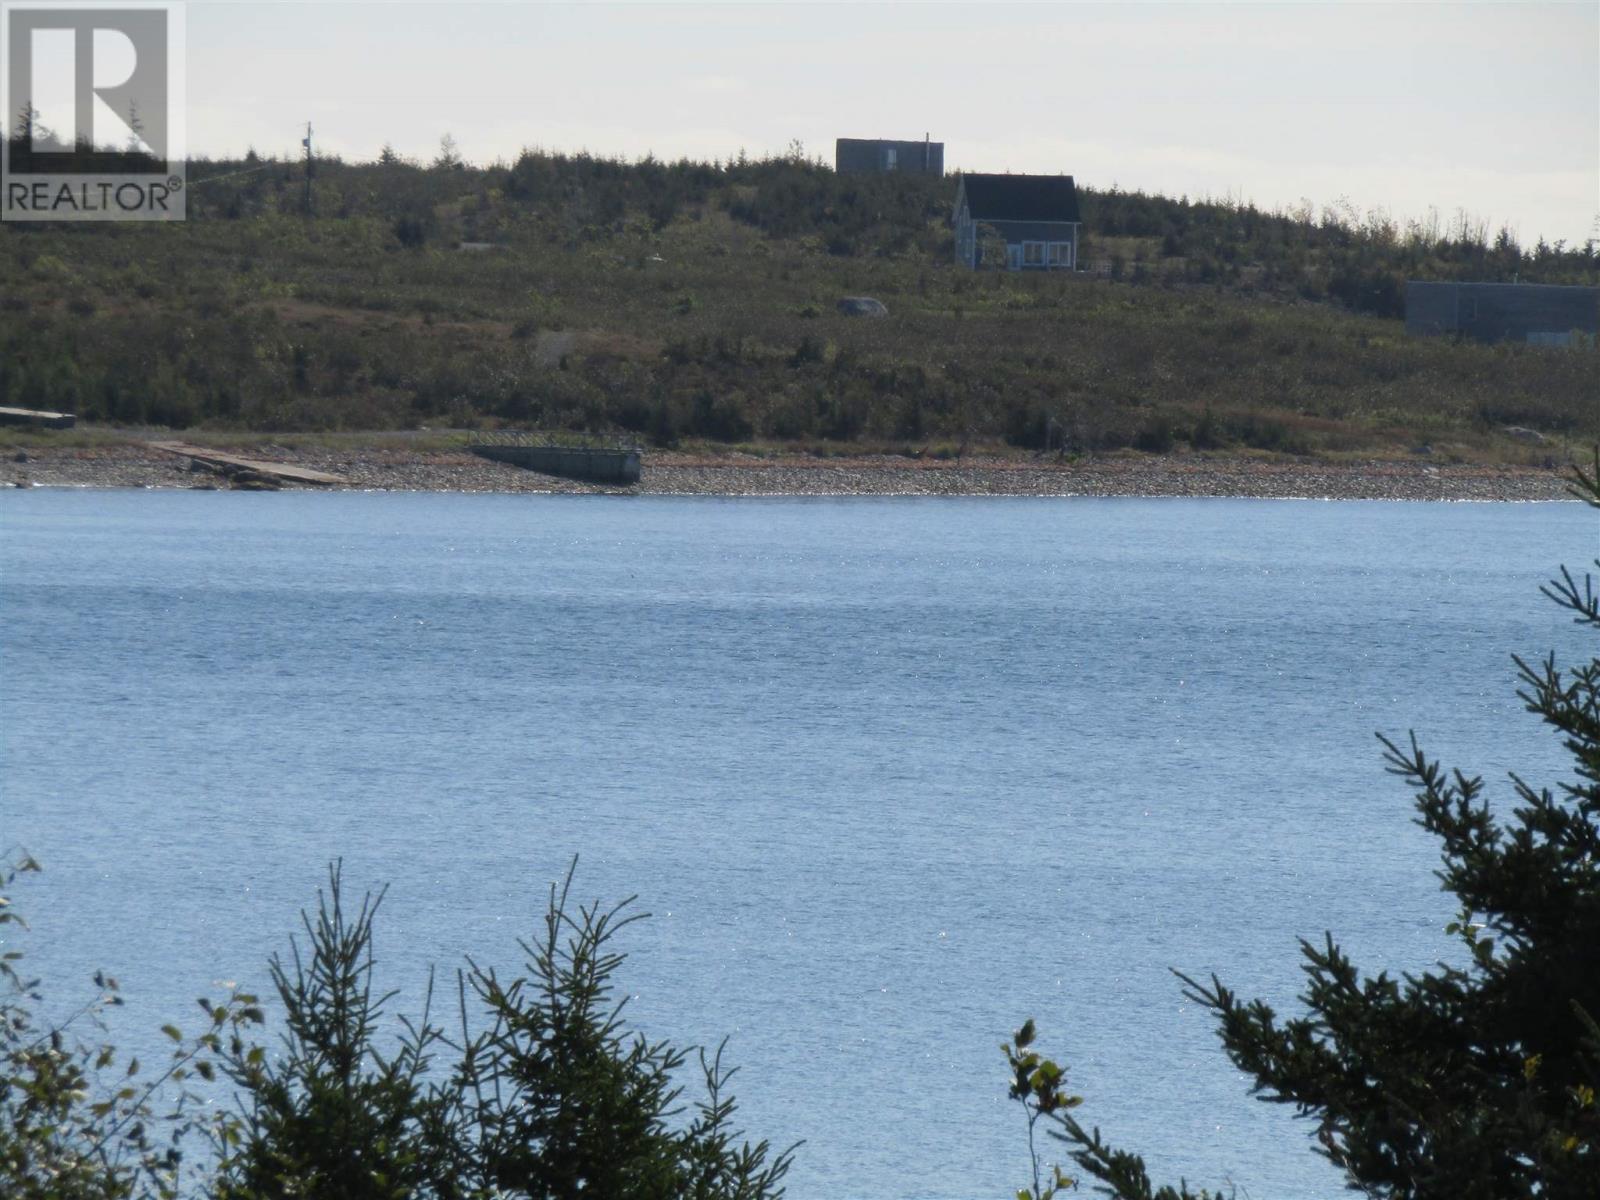 19210 Highway 7, Spry Harbour, Nova Scotia  B2R 1S2 - Photo 2 - 202102577